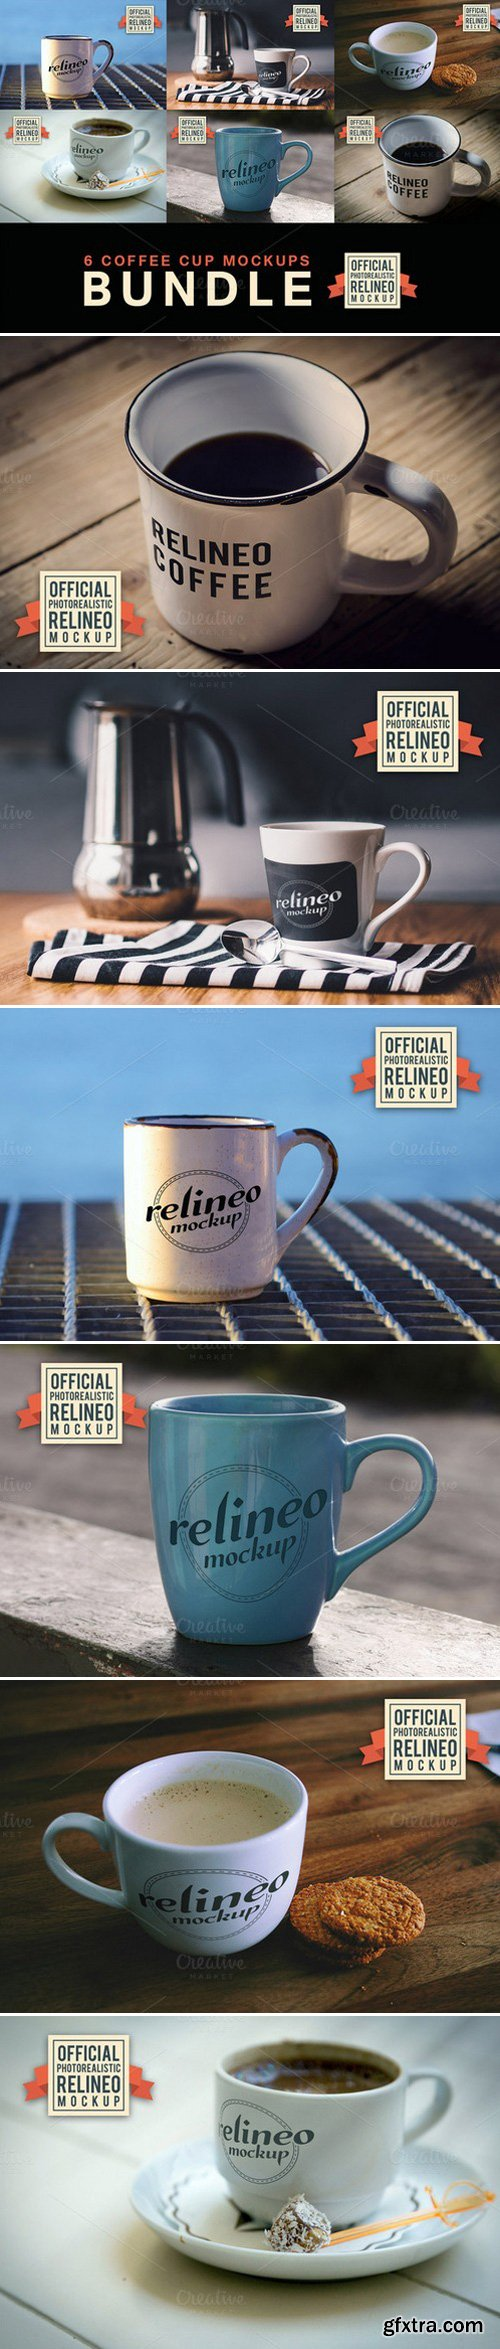 CM - 6 Coffee Cup Mockups 399160